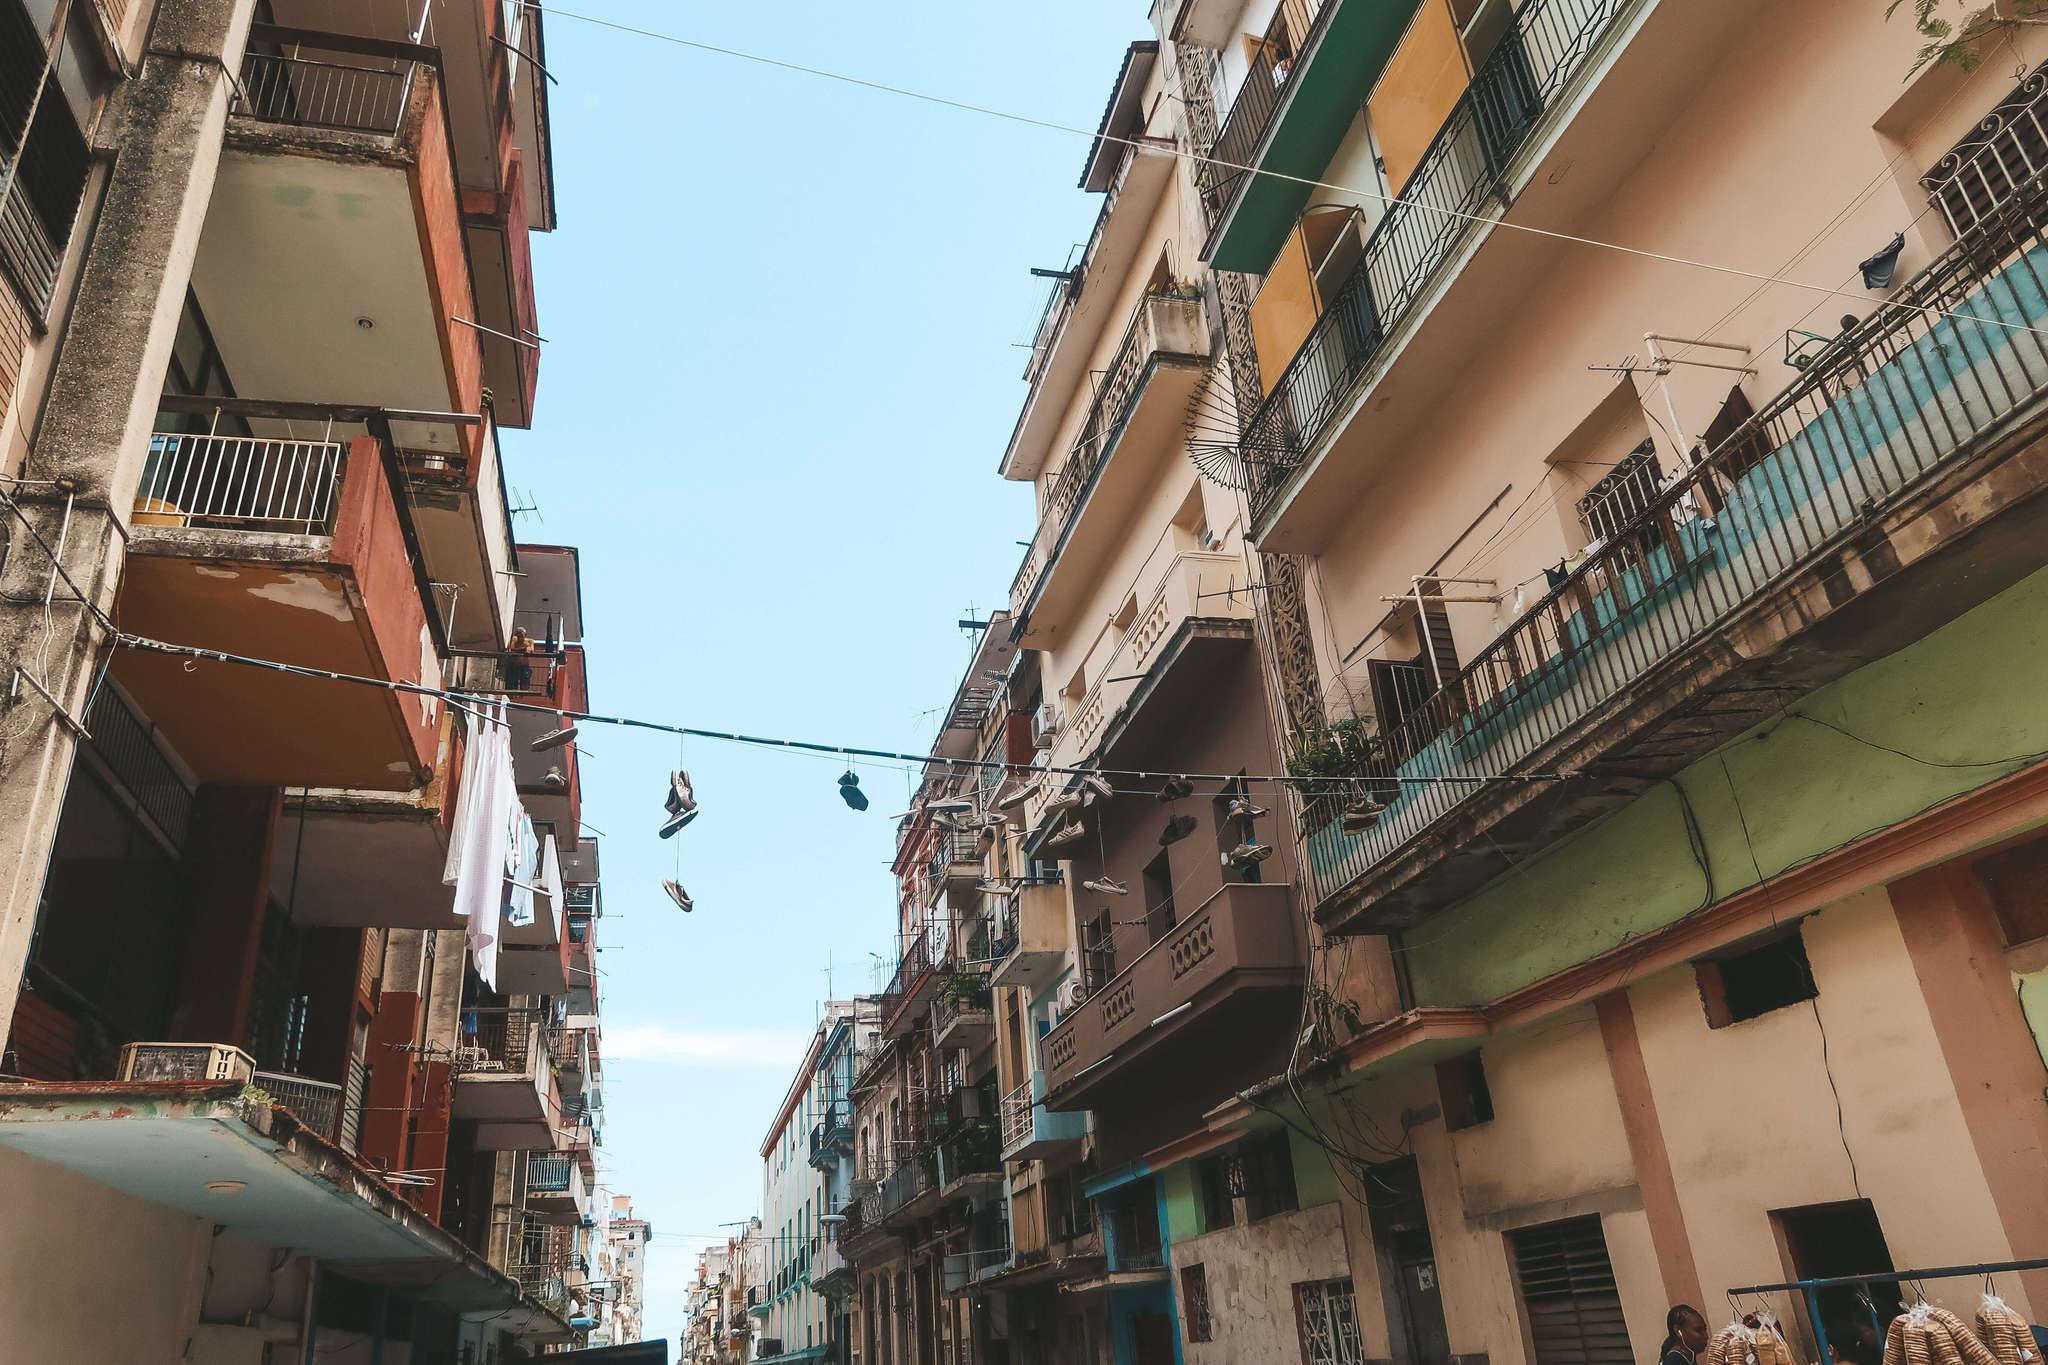 Havana, Cuba street